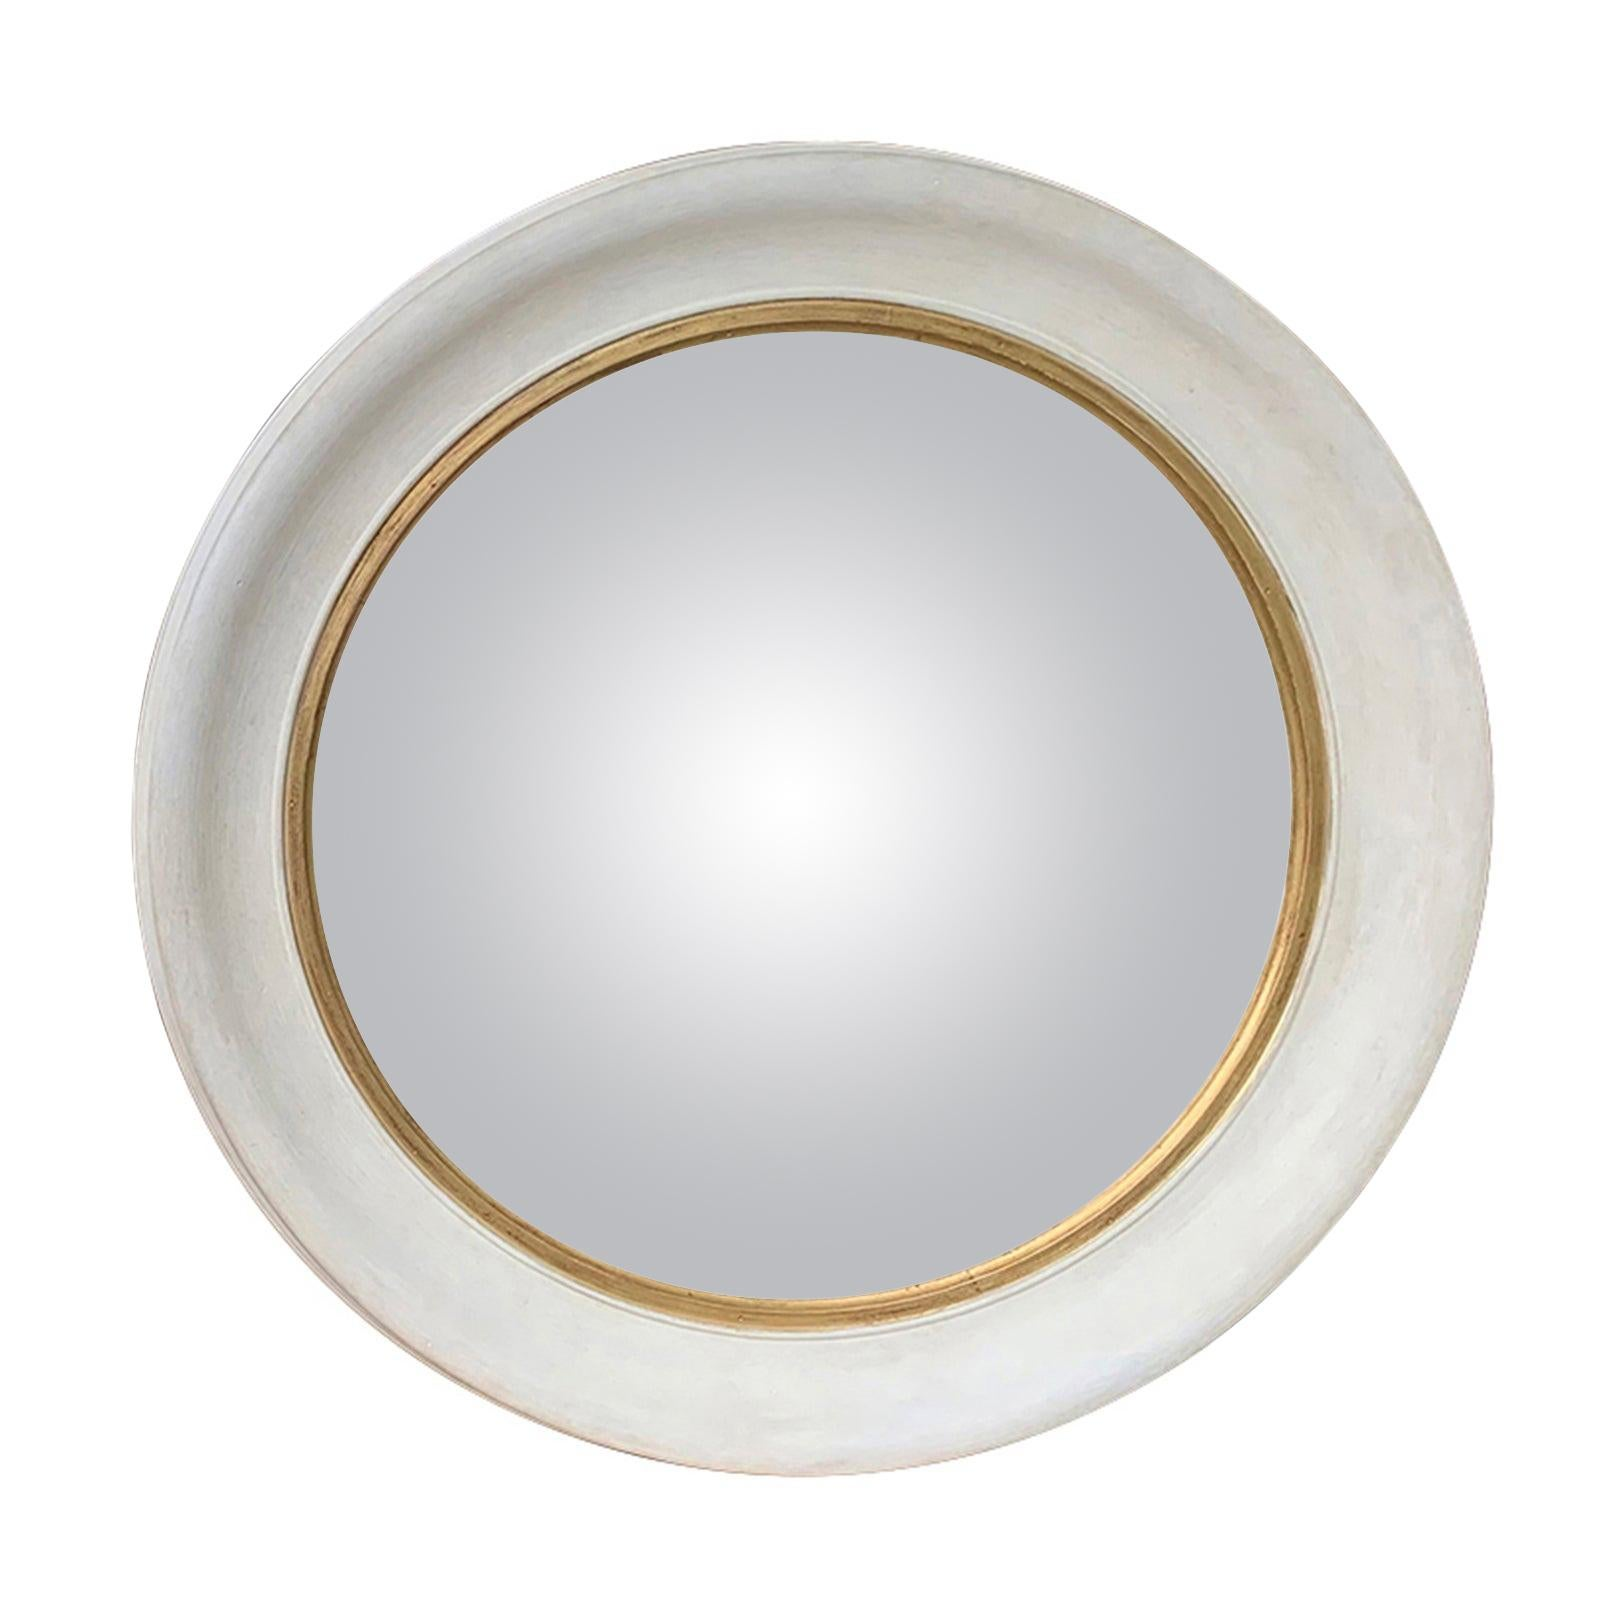 20th Century Round Convex Mirror with Custom Hand Painted Finish